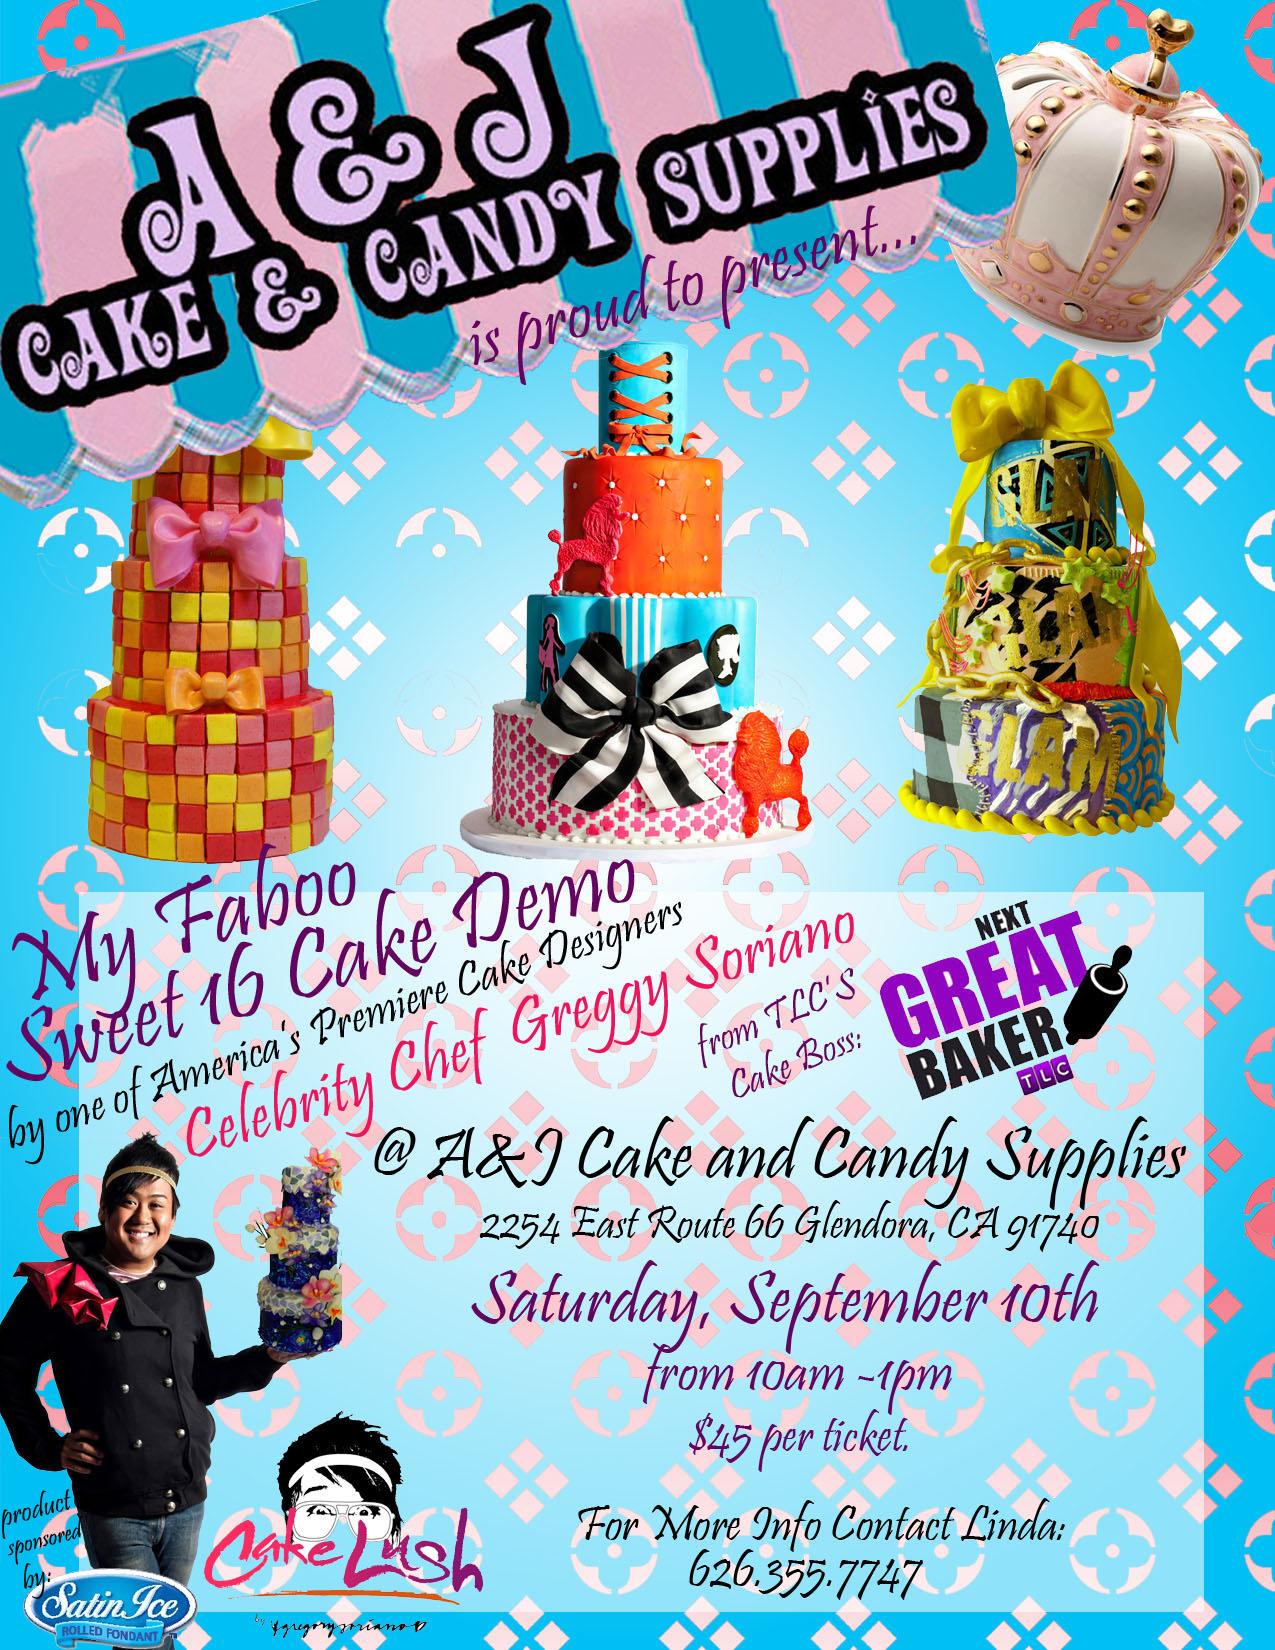 A And J Cake Decorating Glendora : Greggy Soriano s Faboo Sweet Sixteen Cake Demo at A&J Cake ...